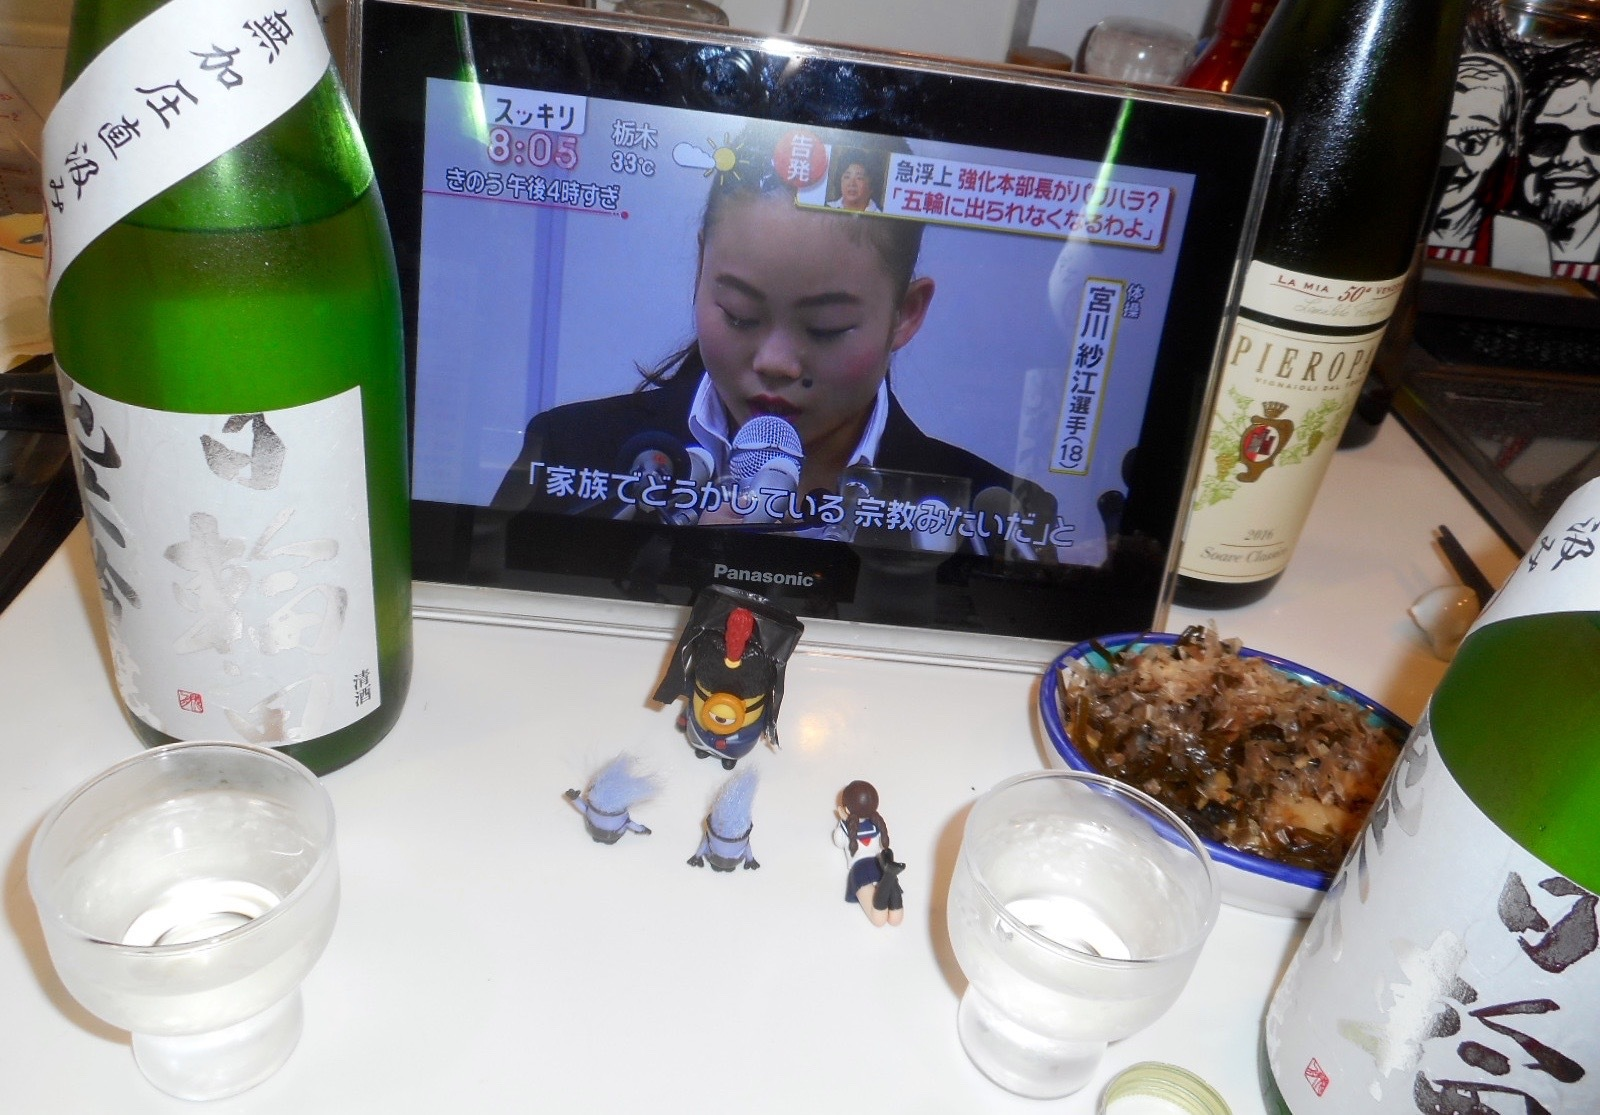 hiwata_mukaatsu28by2_7.jpg